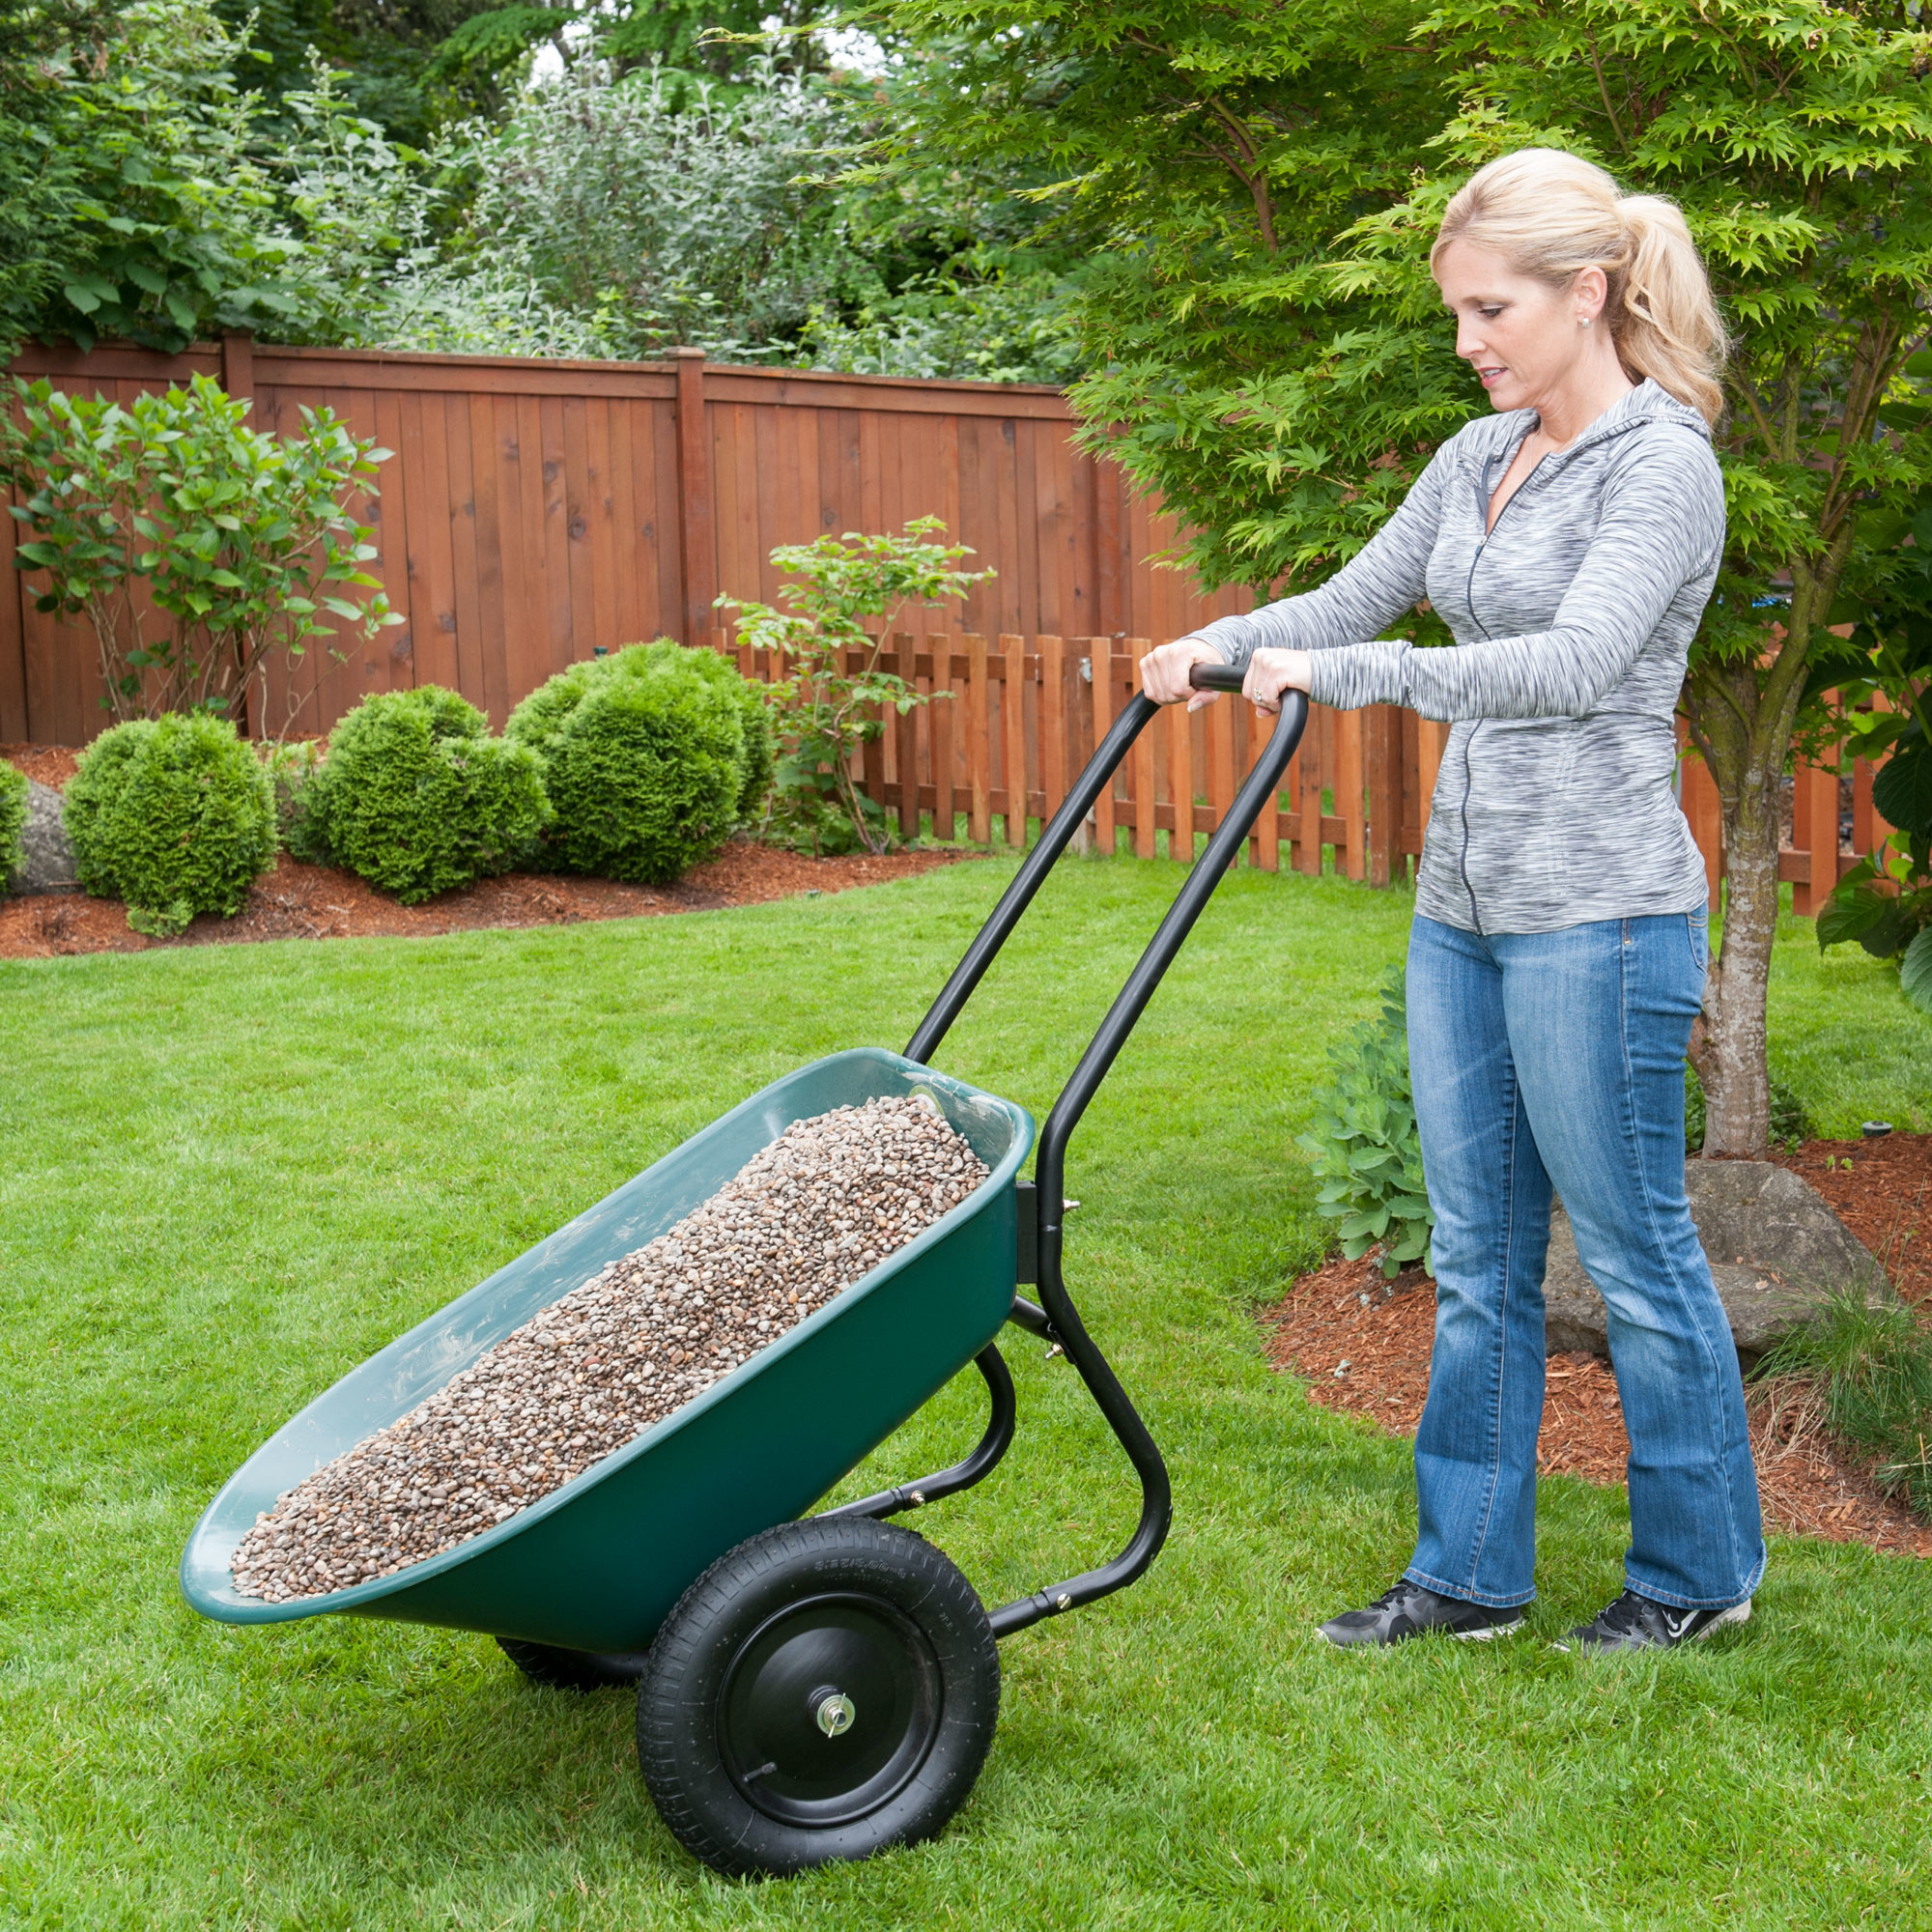 Model using a green wheelbarrow with black wheels and handle